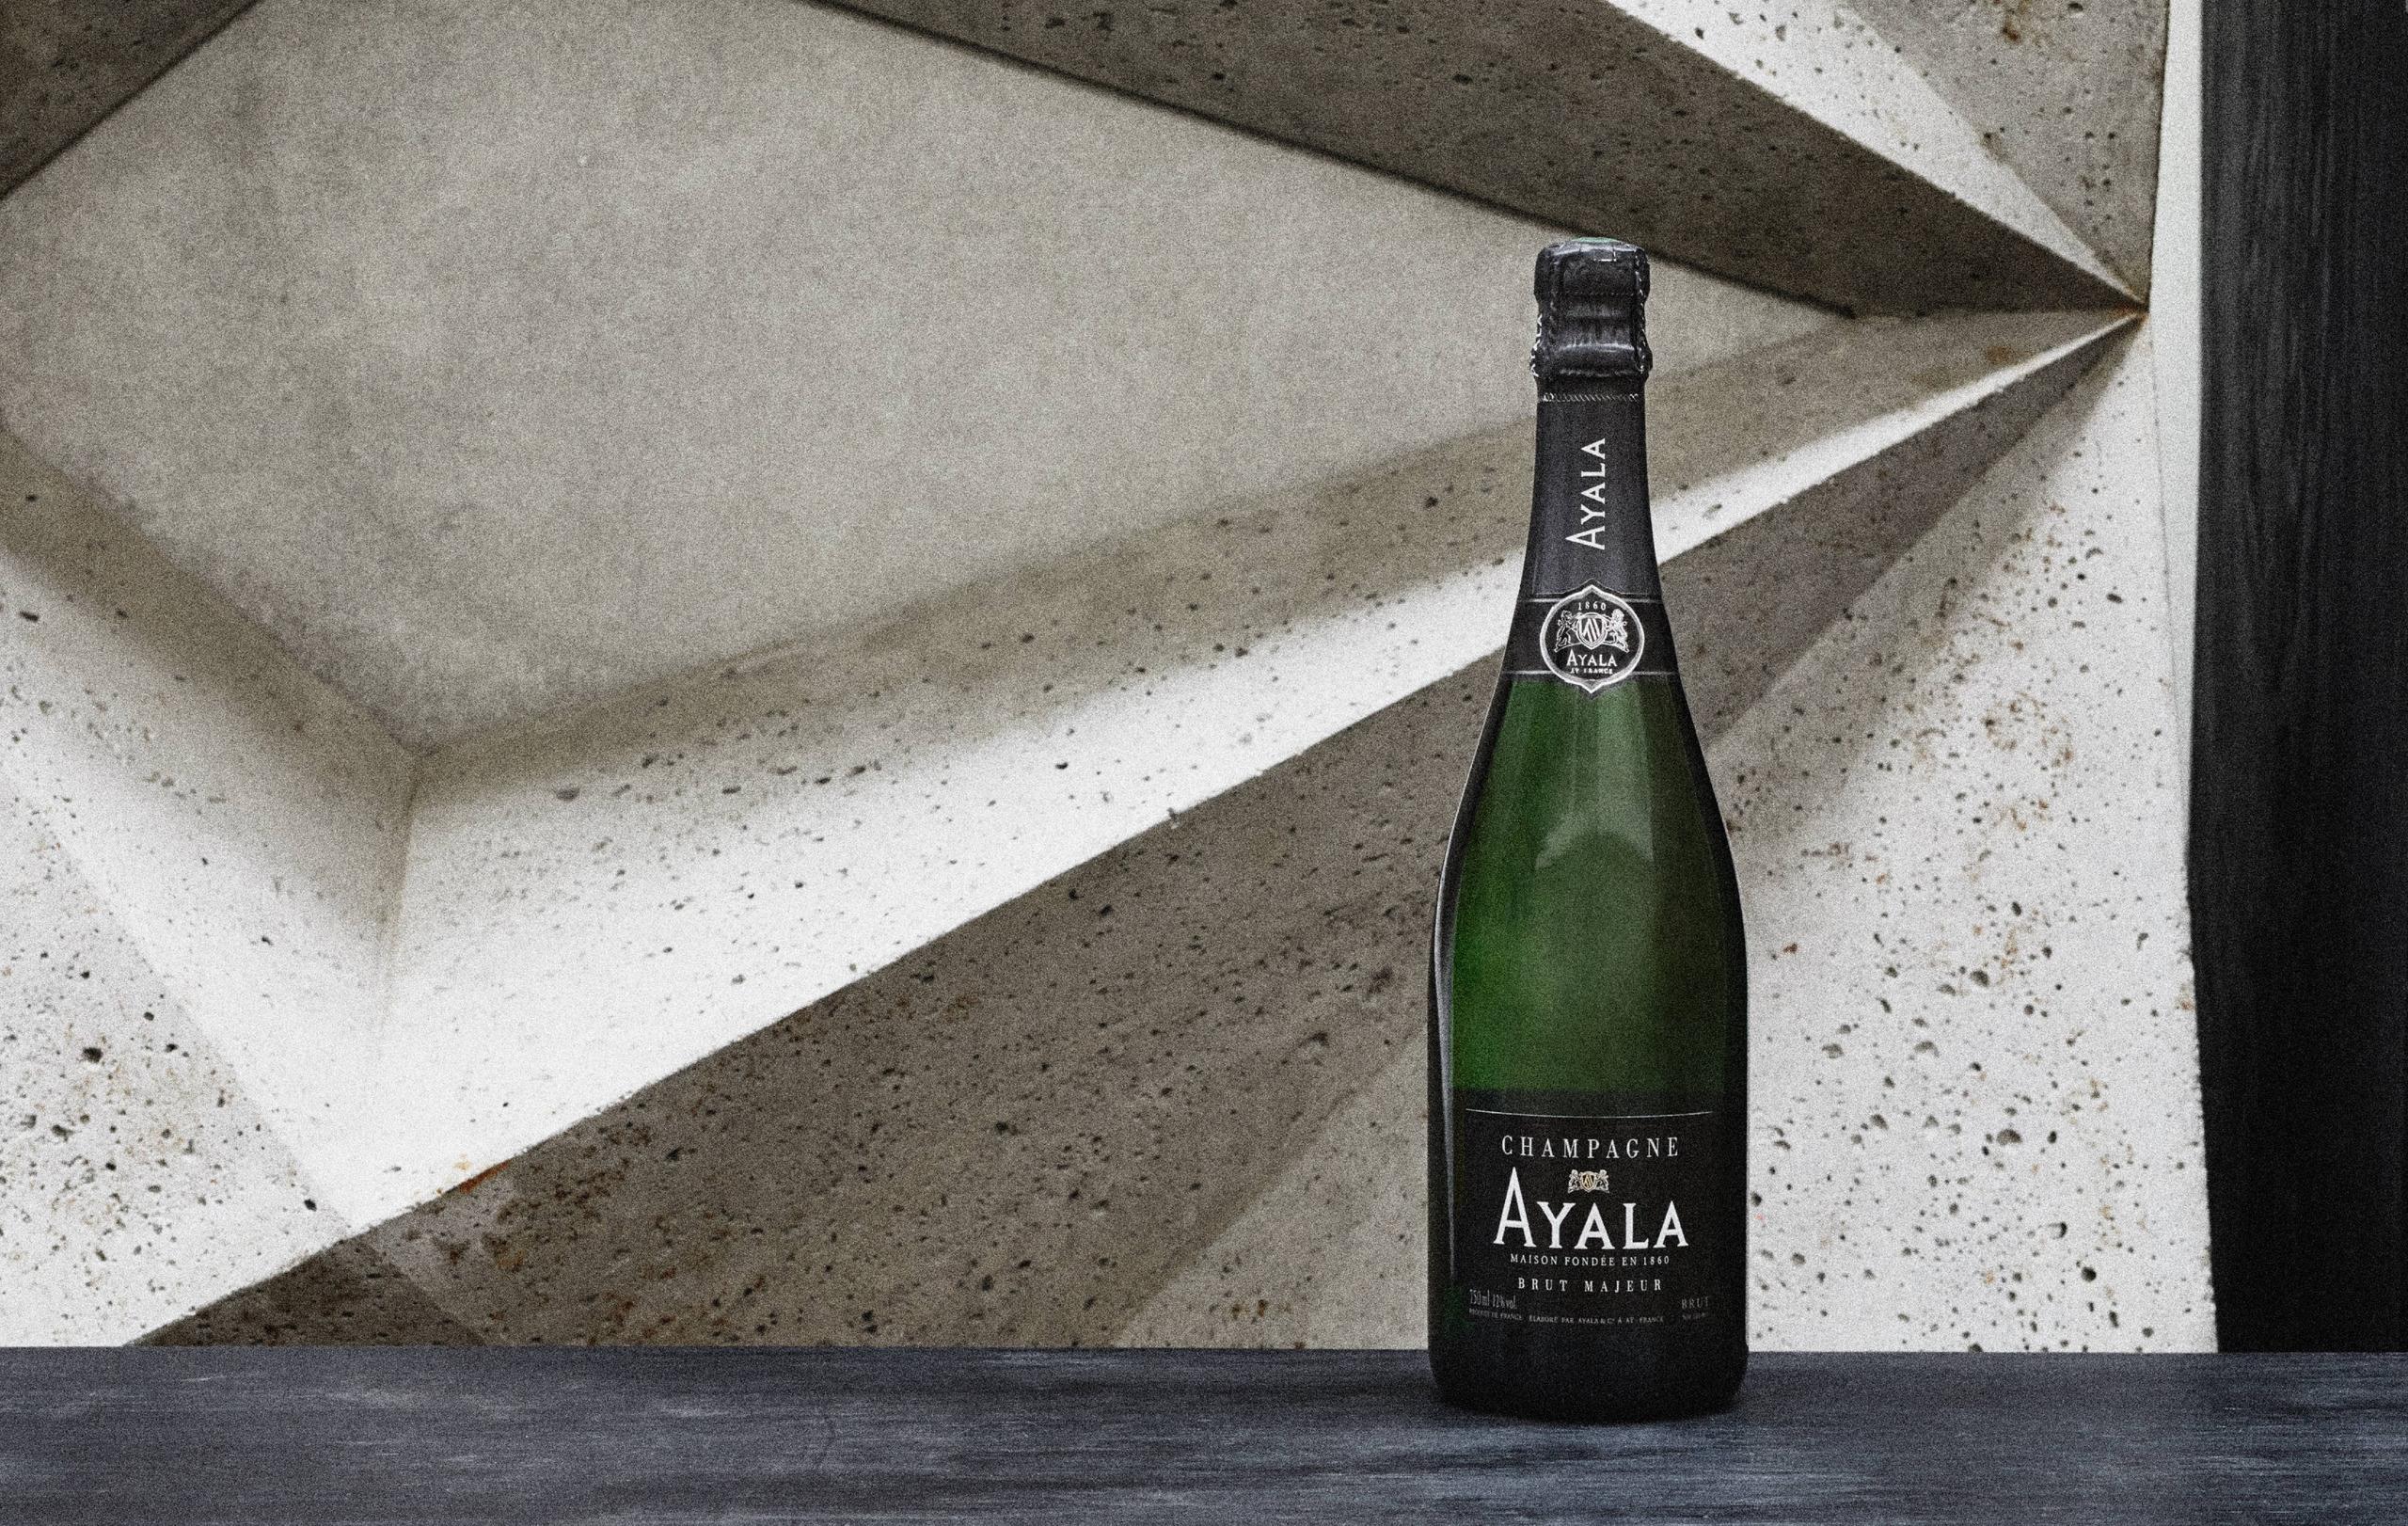 Les Champagnes - Champagne Ayala